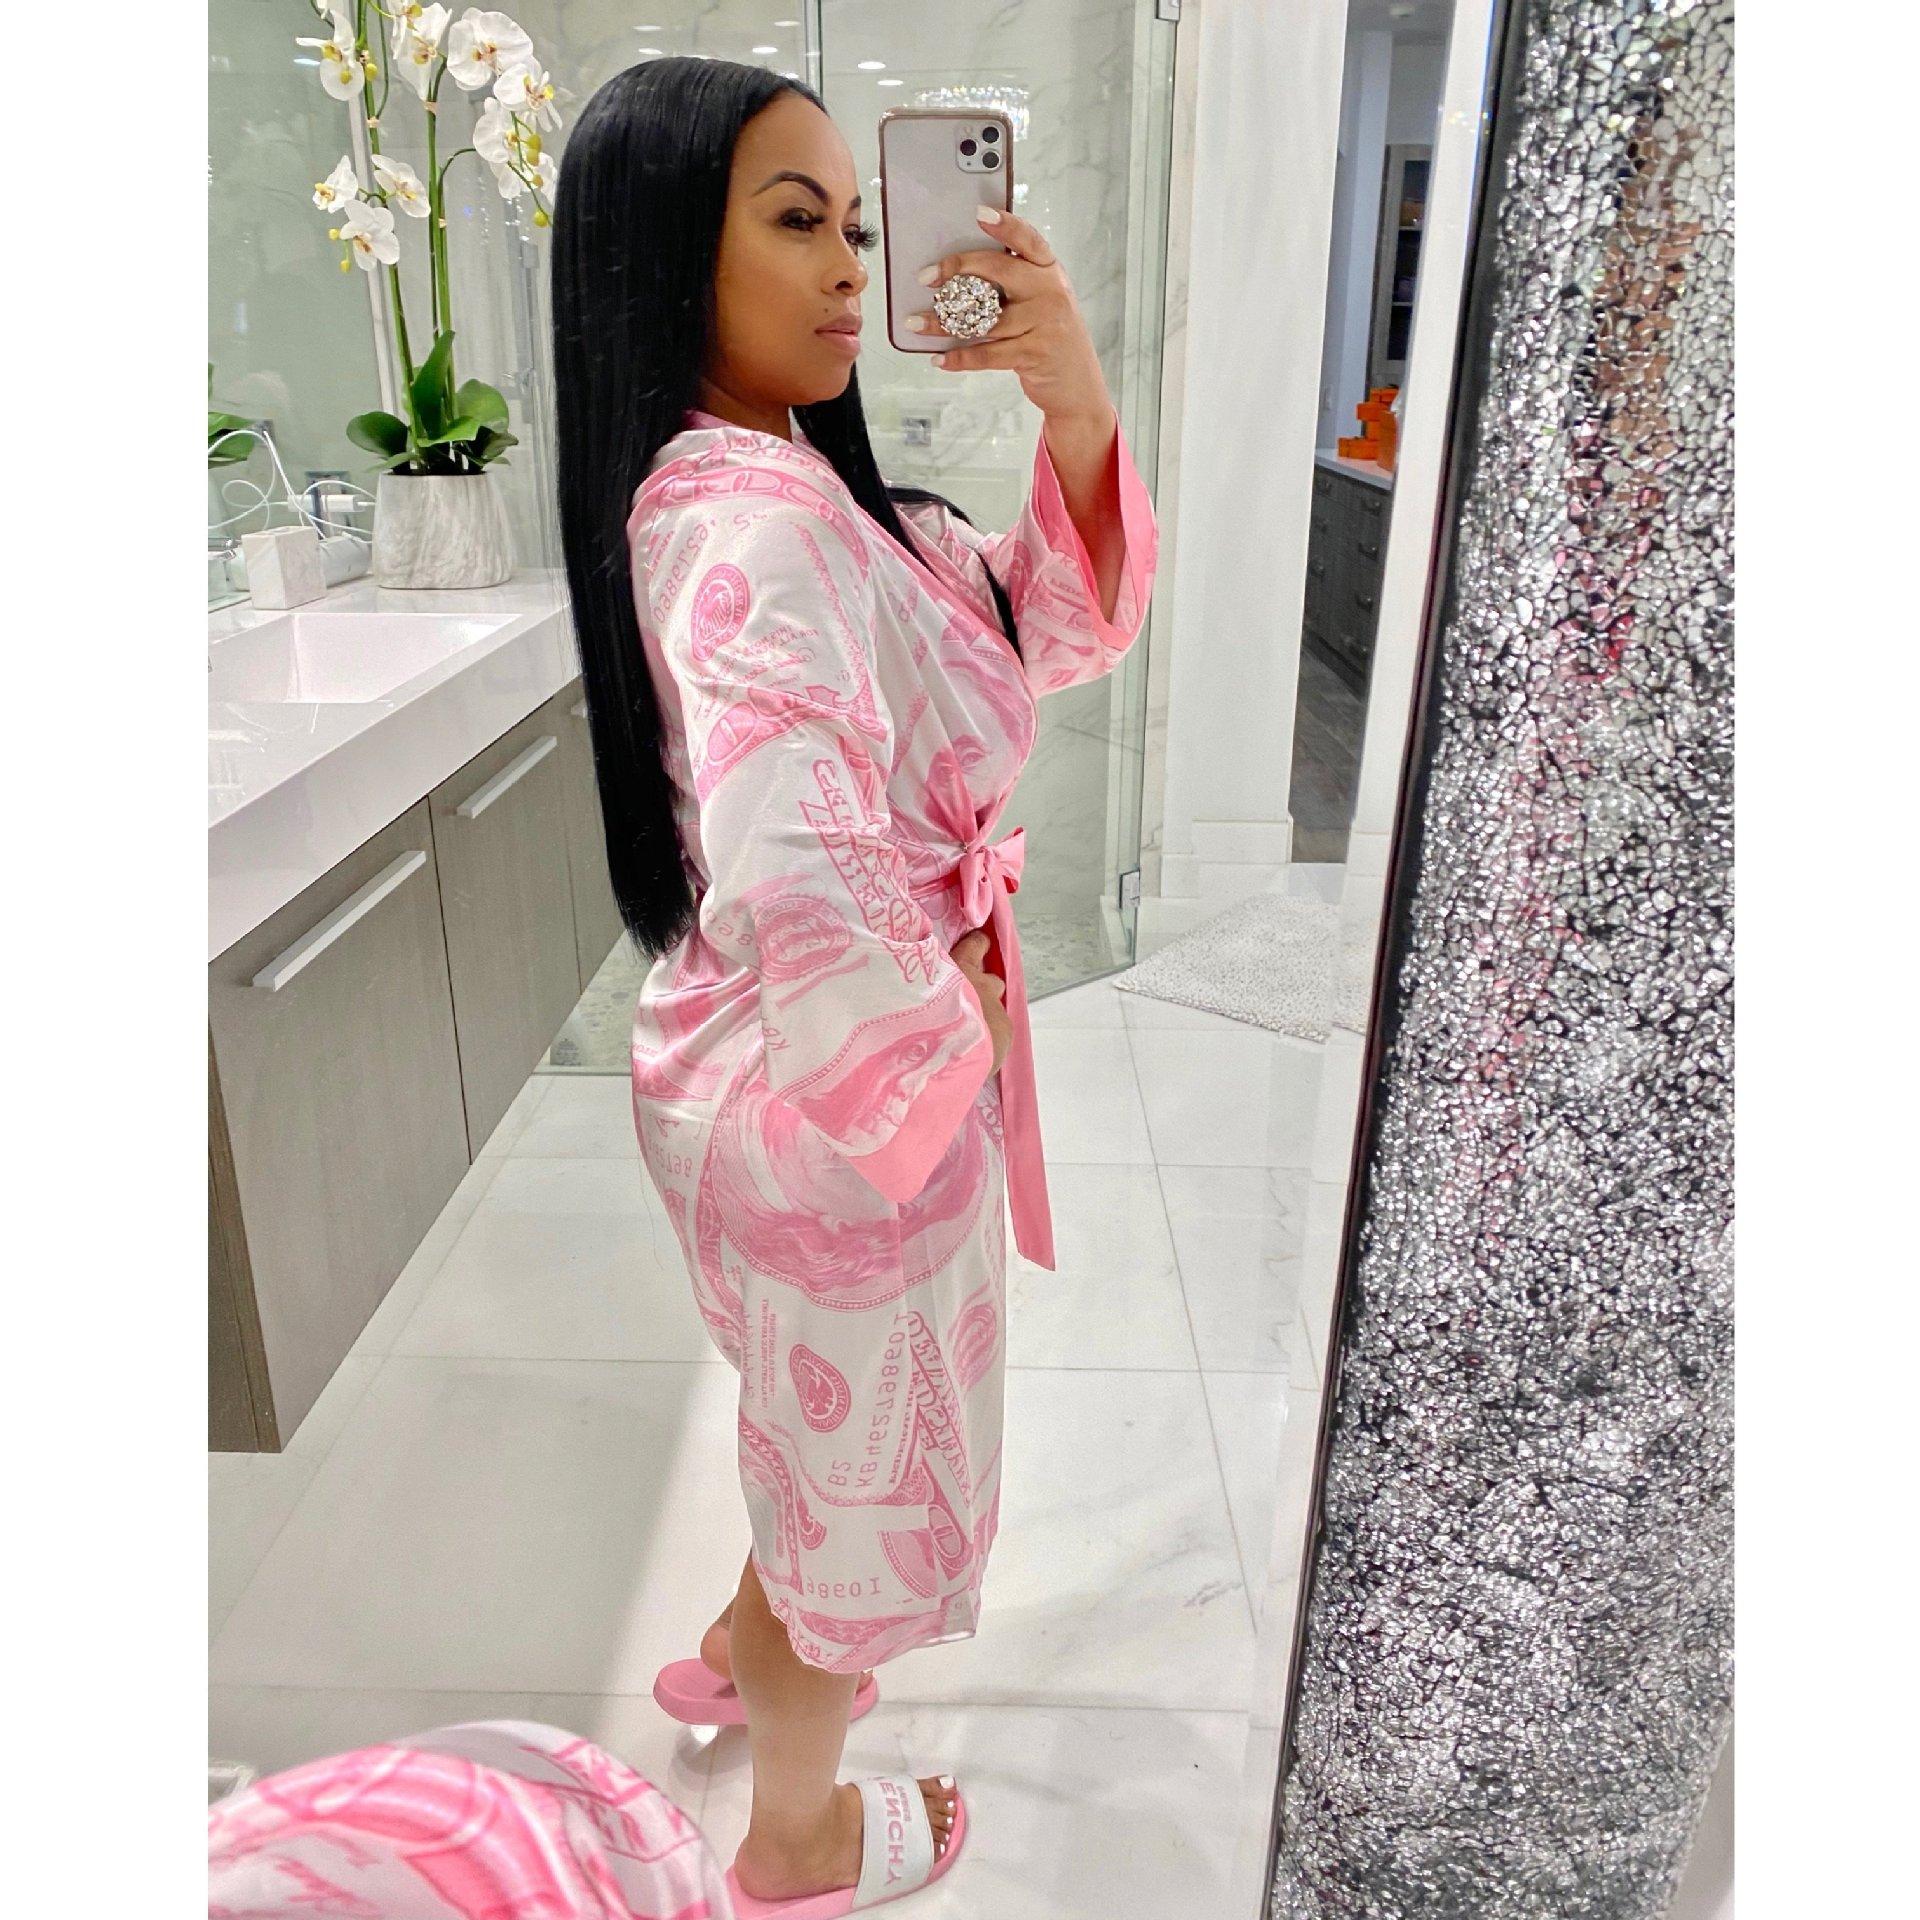 M0360 New arrivals 2020 sexy satin sleepwear women loungewear money print bath robe